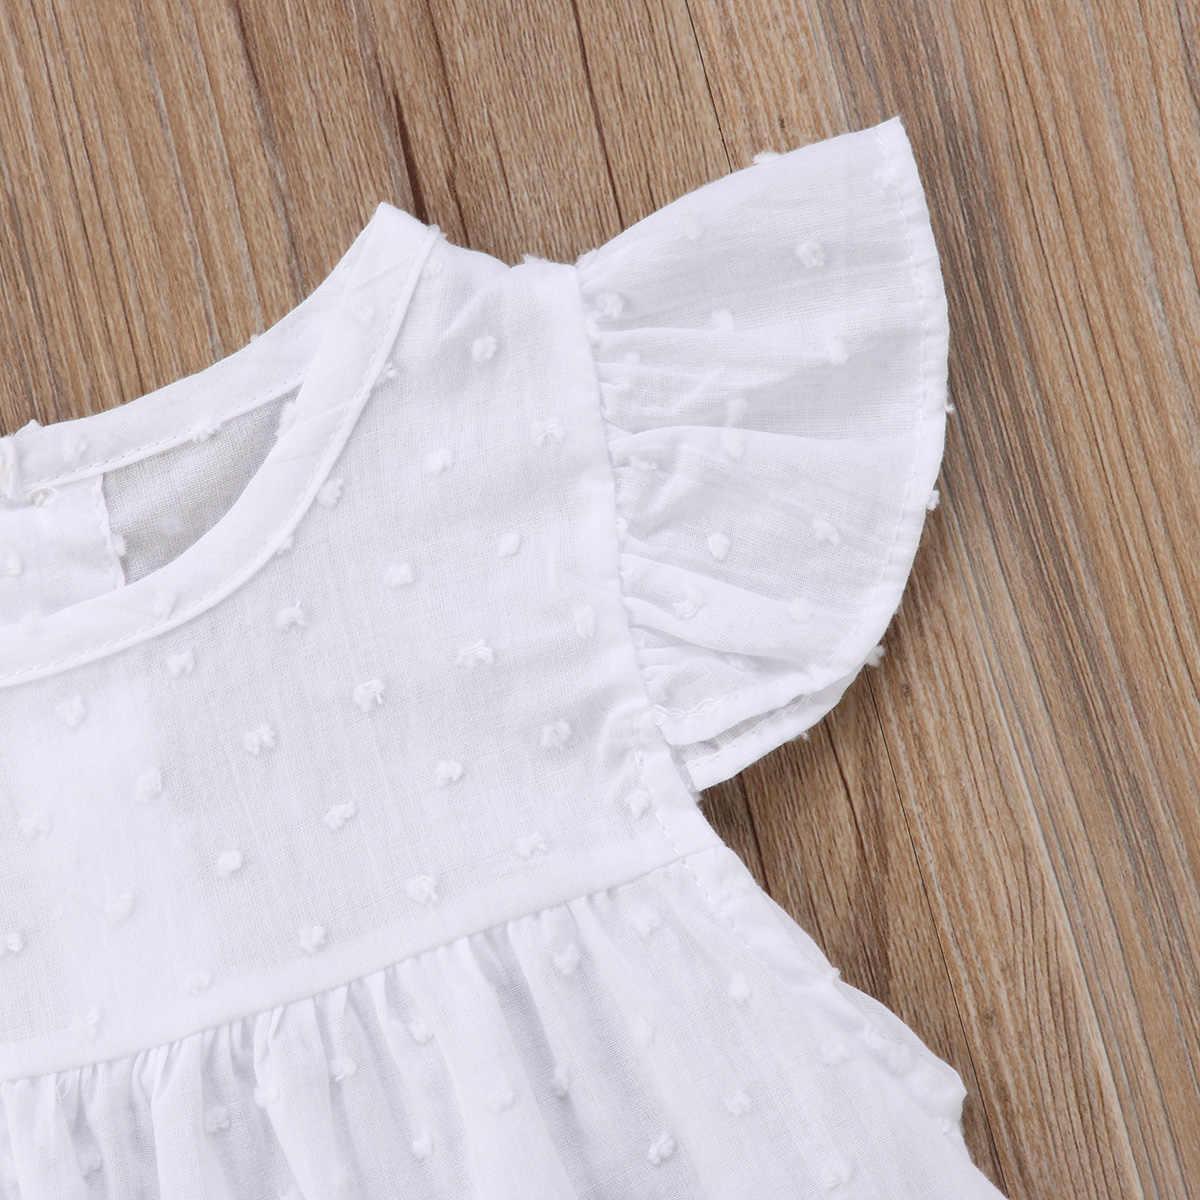 Pudcoco לבן שמלת תינוק נסיכת טוטו בנות תינוק פעוט שמלת חג יום הולדת Praty שמלות קיץ שרוולים קצרים